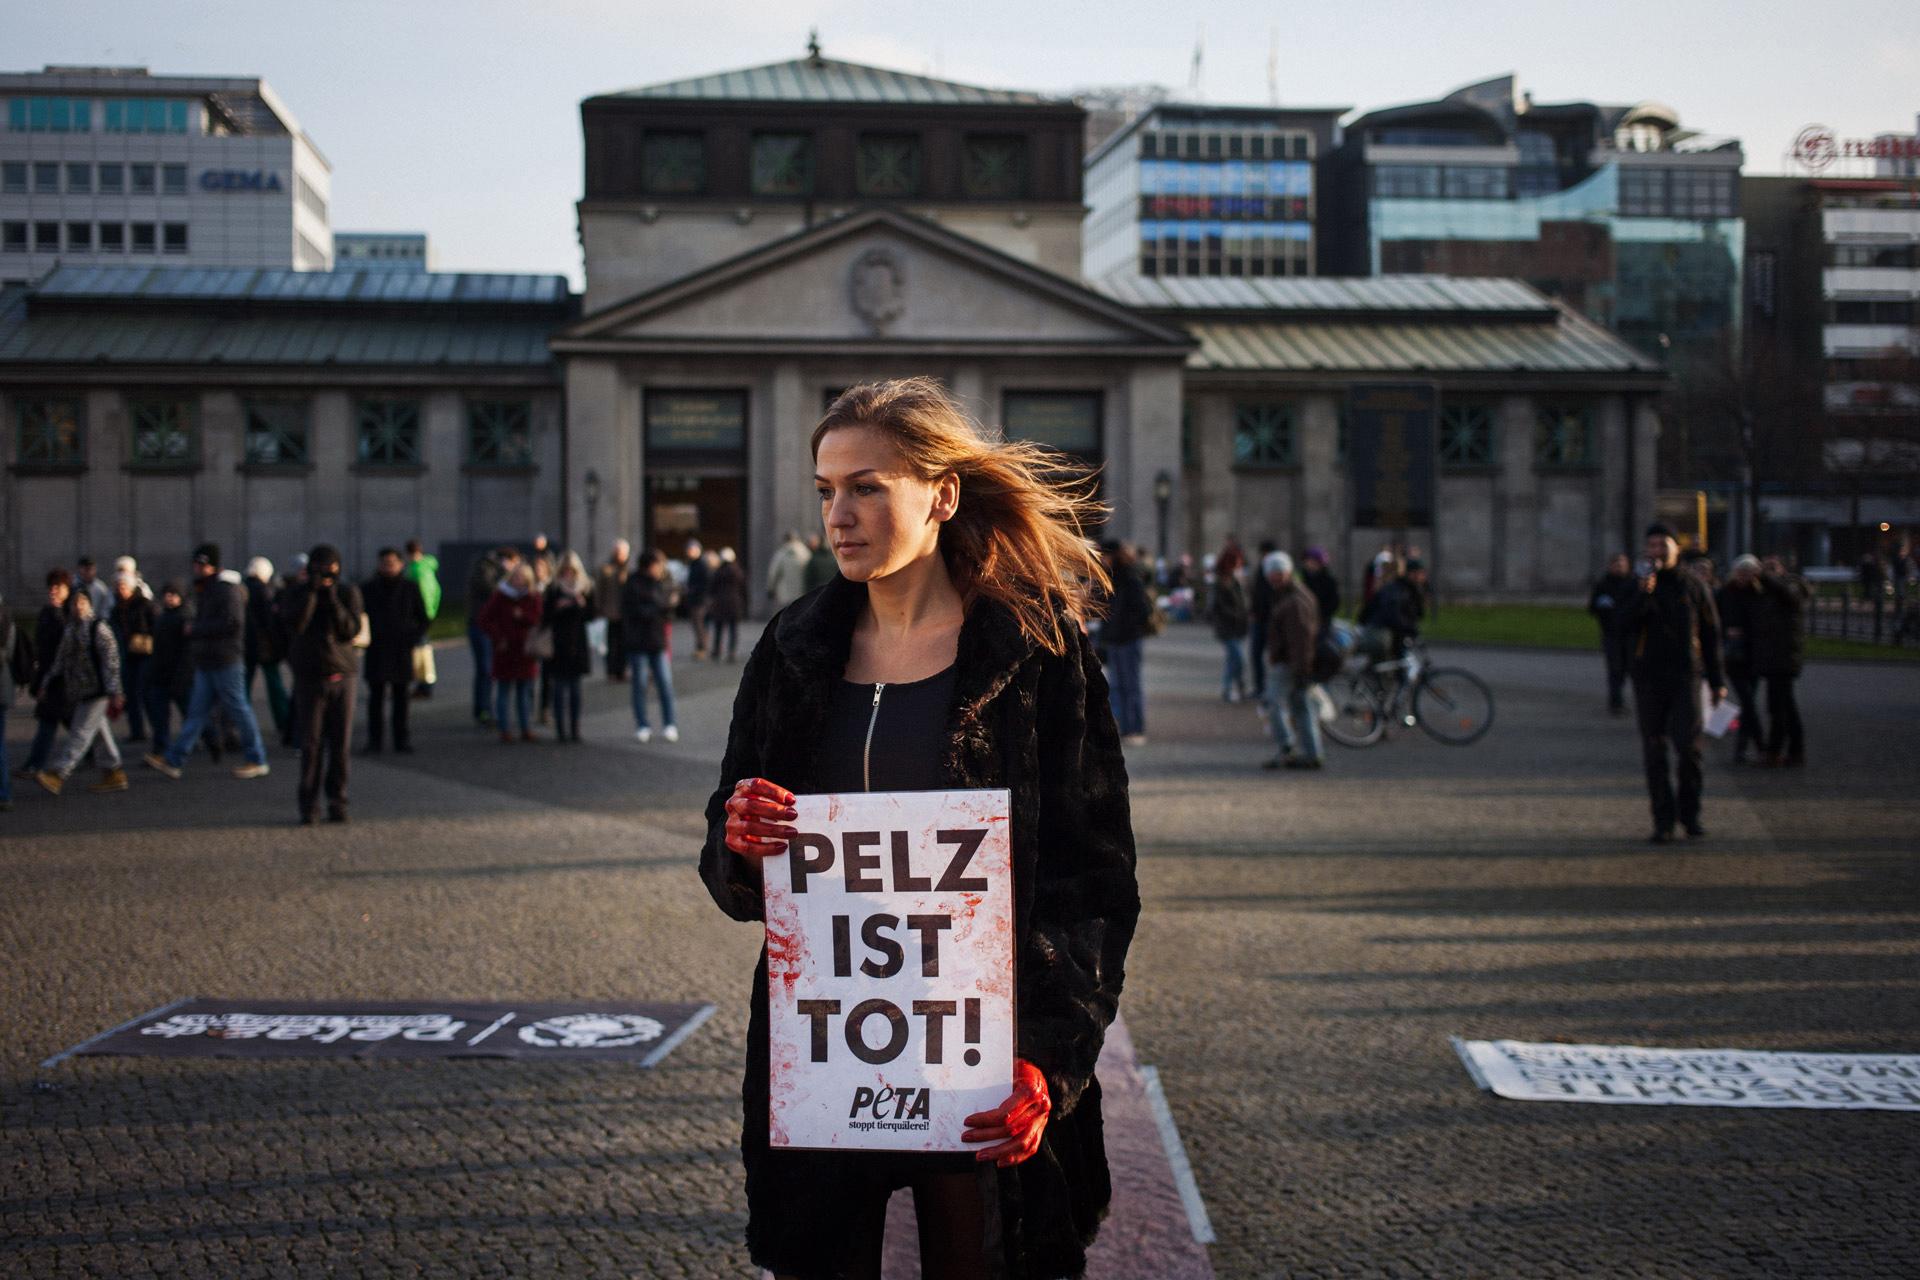 timo-stammberger-photography-fotografie-animal-rights-tierrechte-activism-aktivismus-peta-pelz-fur-compassion